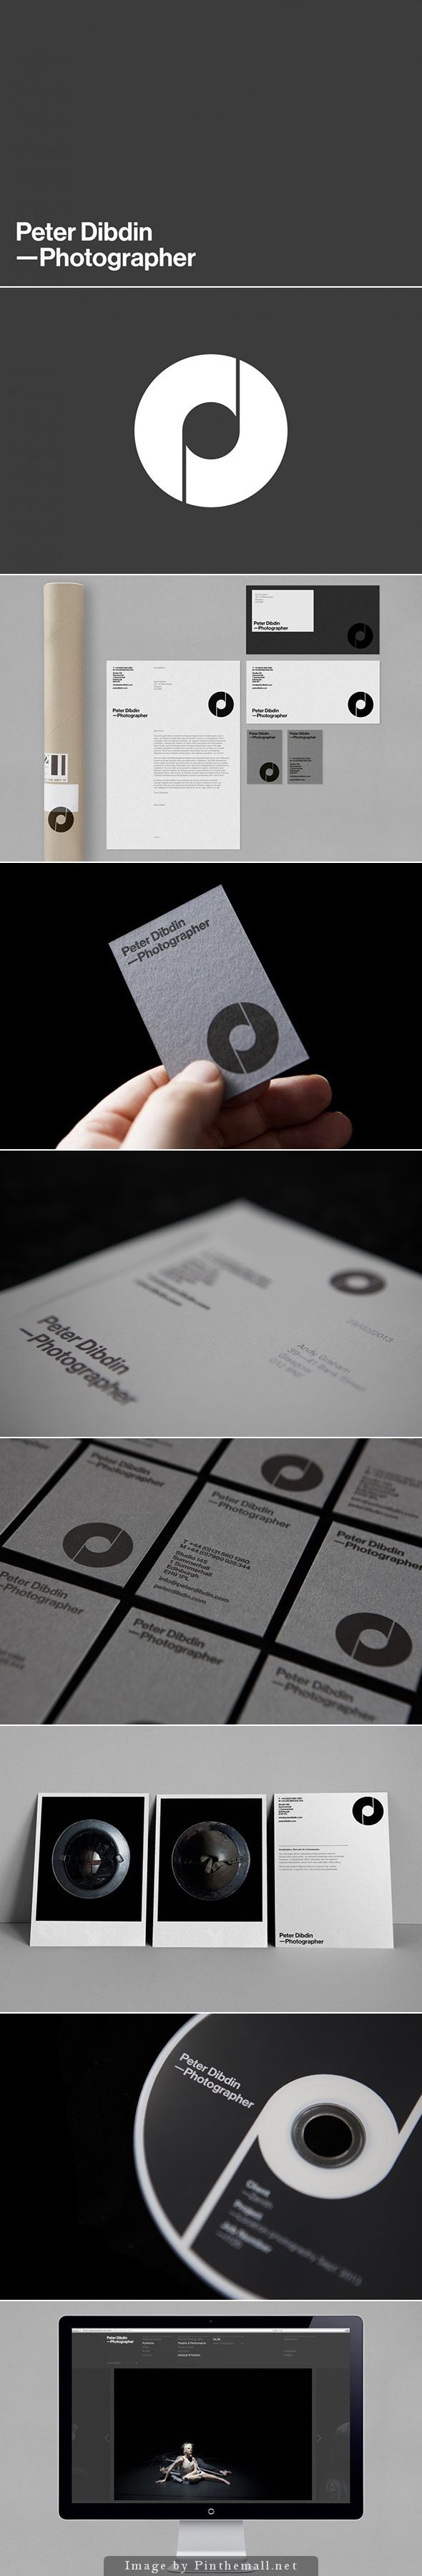 Peter Dibdin personal branding. Design by ostreet - created via http://pinthemall.net: